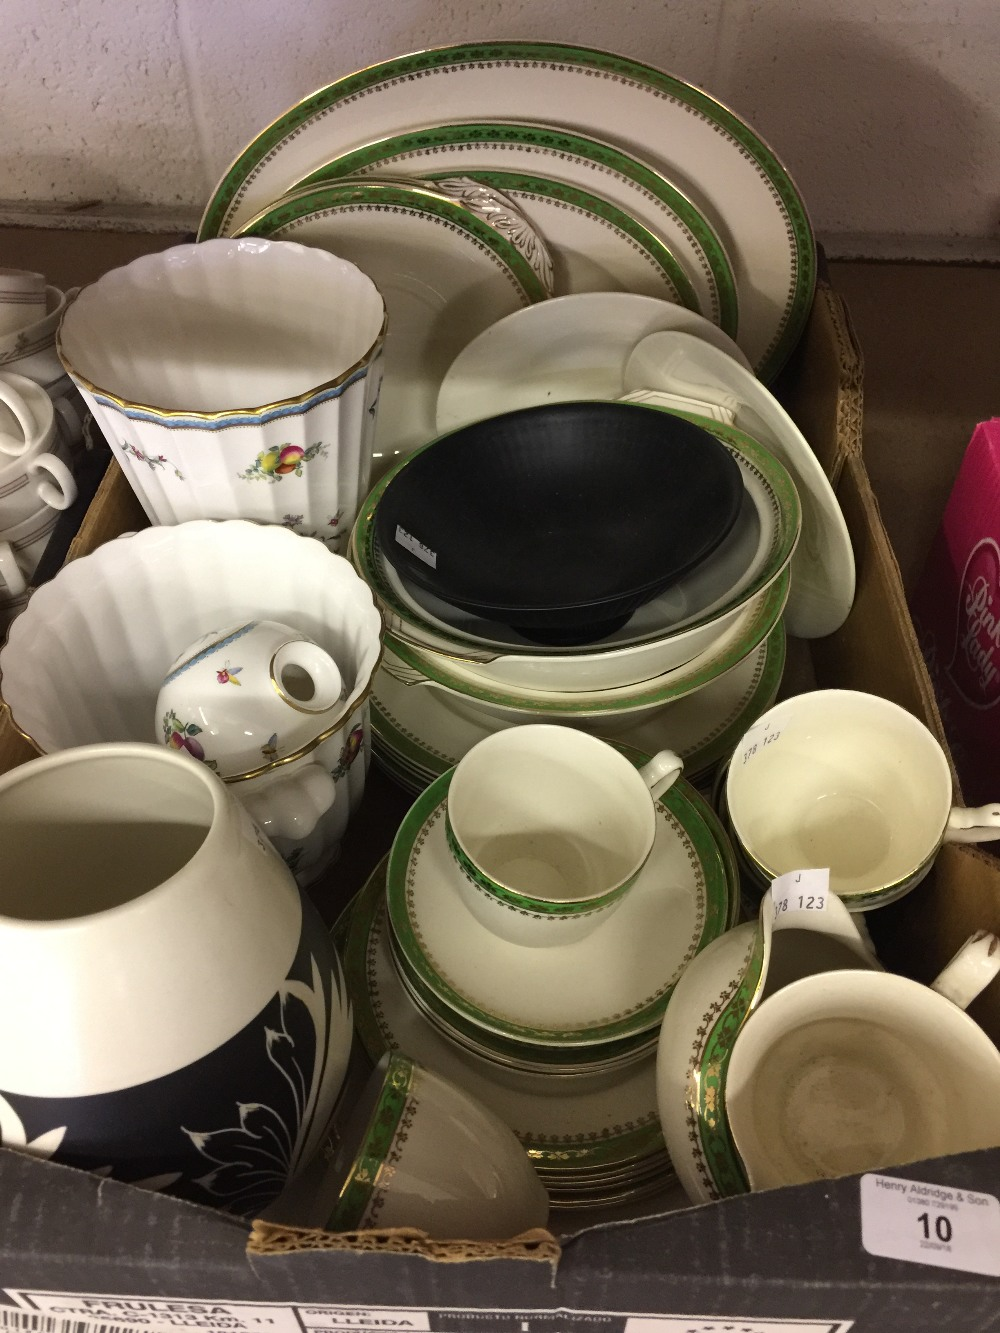 Lot 10 - 20th cent. Ceramics: Spode Trapnell 2 handle vase, ridge vase on circular base, miniature long